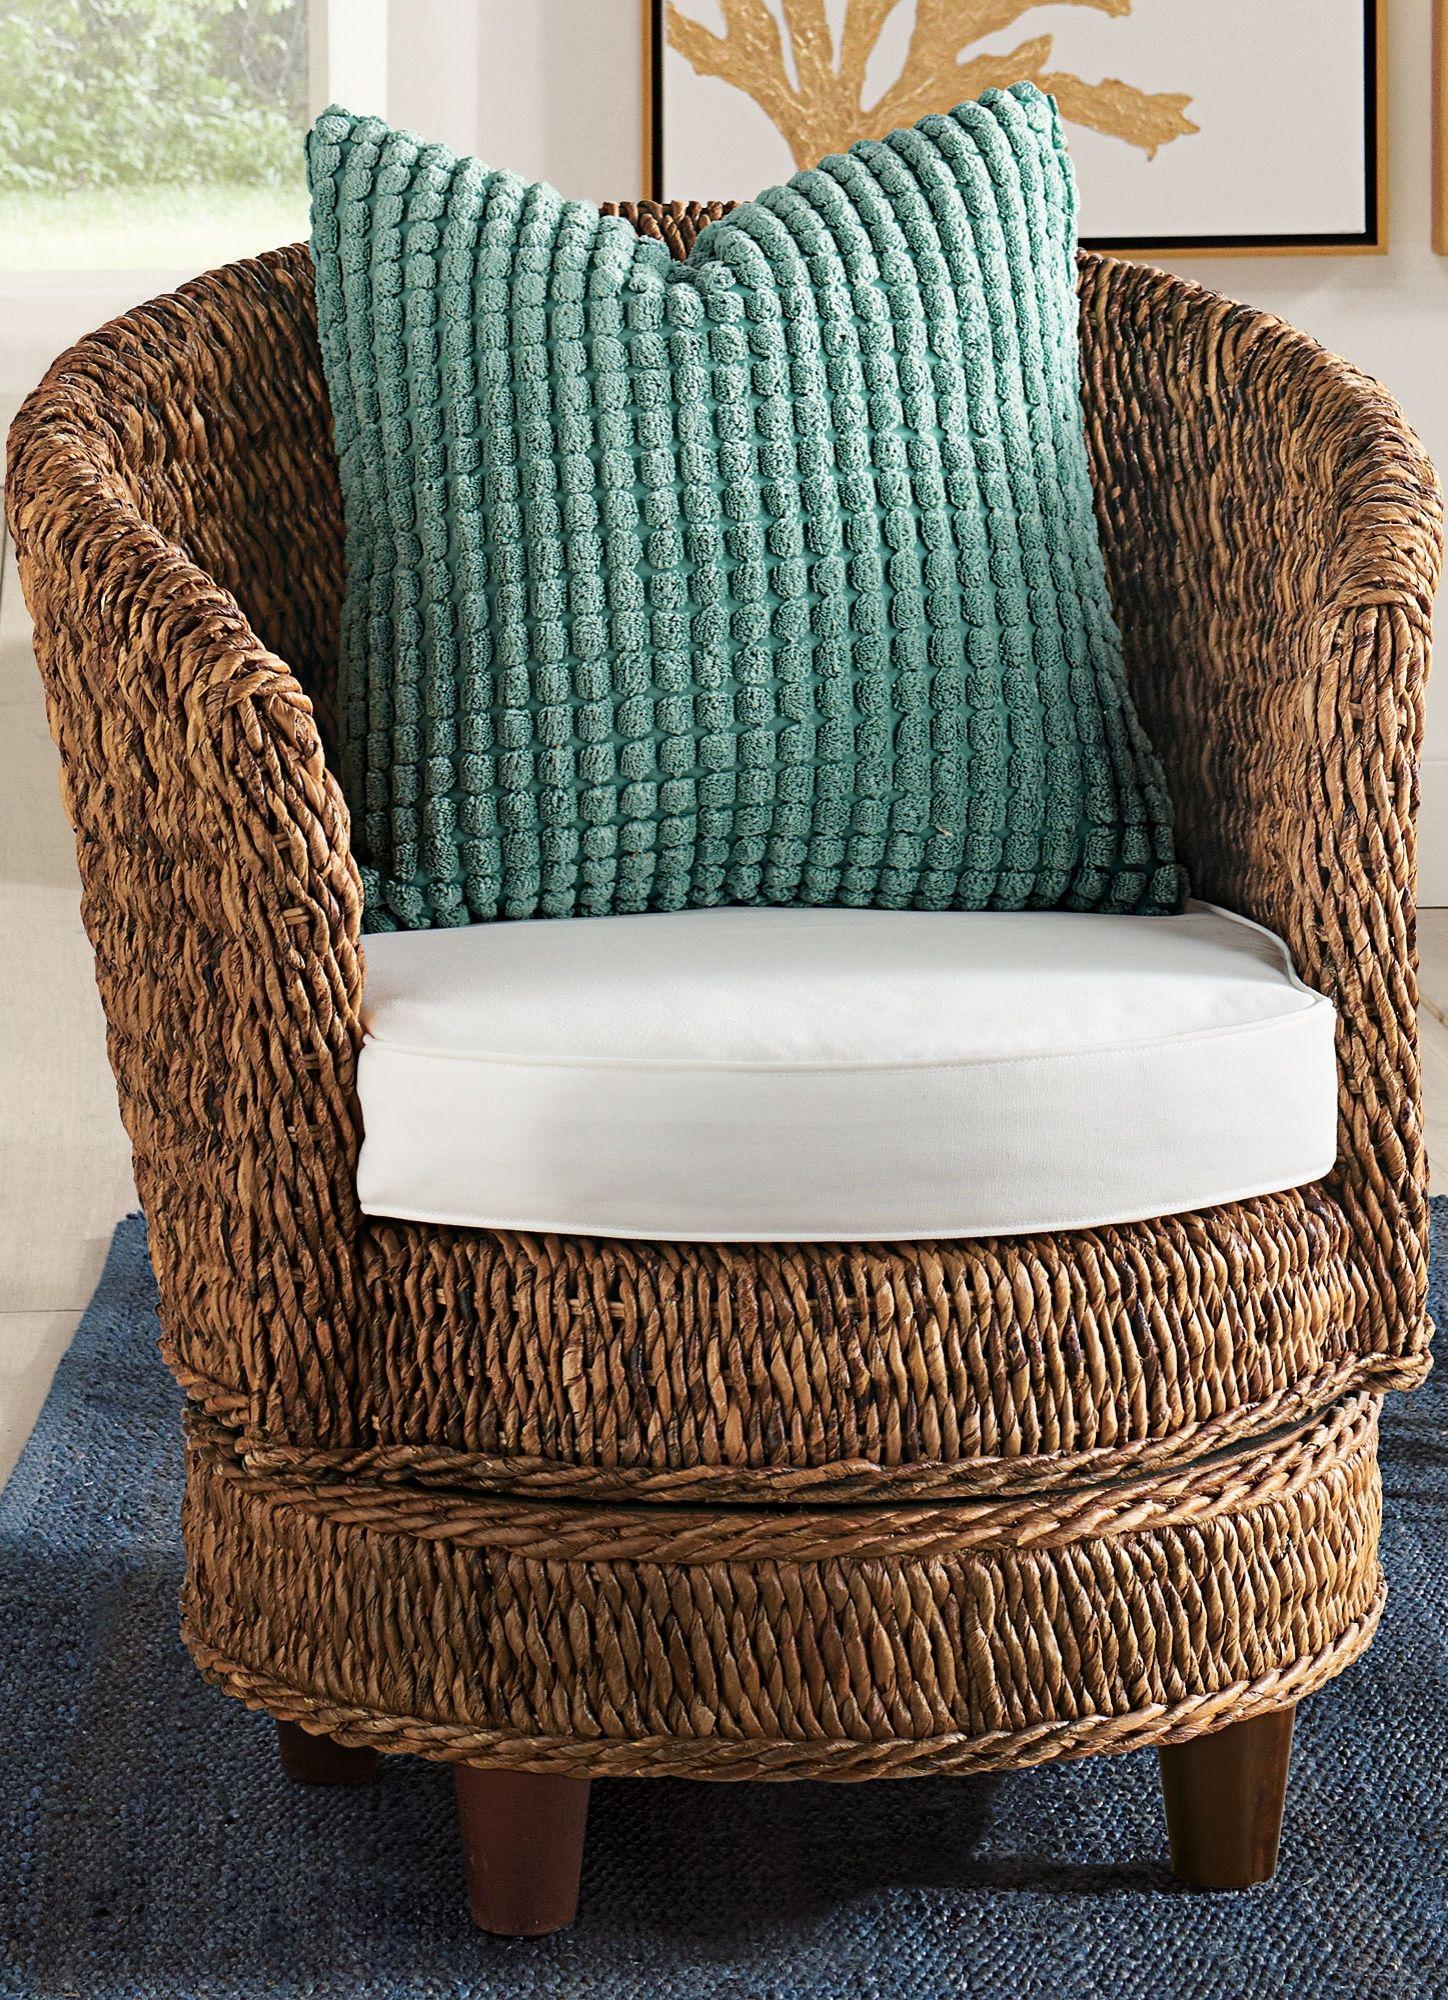 Enjoyable Cyprus Swivel Chair Misc Stuff Swivel Chair Wicker Evergreenethics Interior Chair Design Evergreenethicsorg